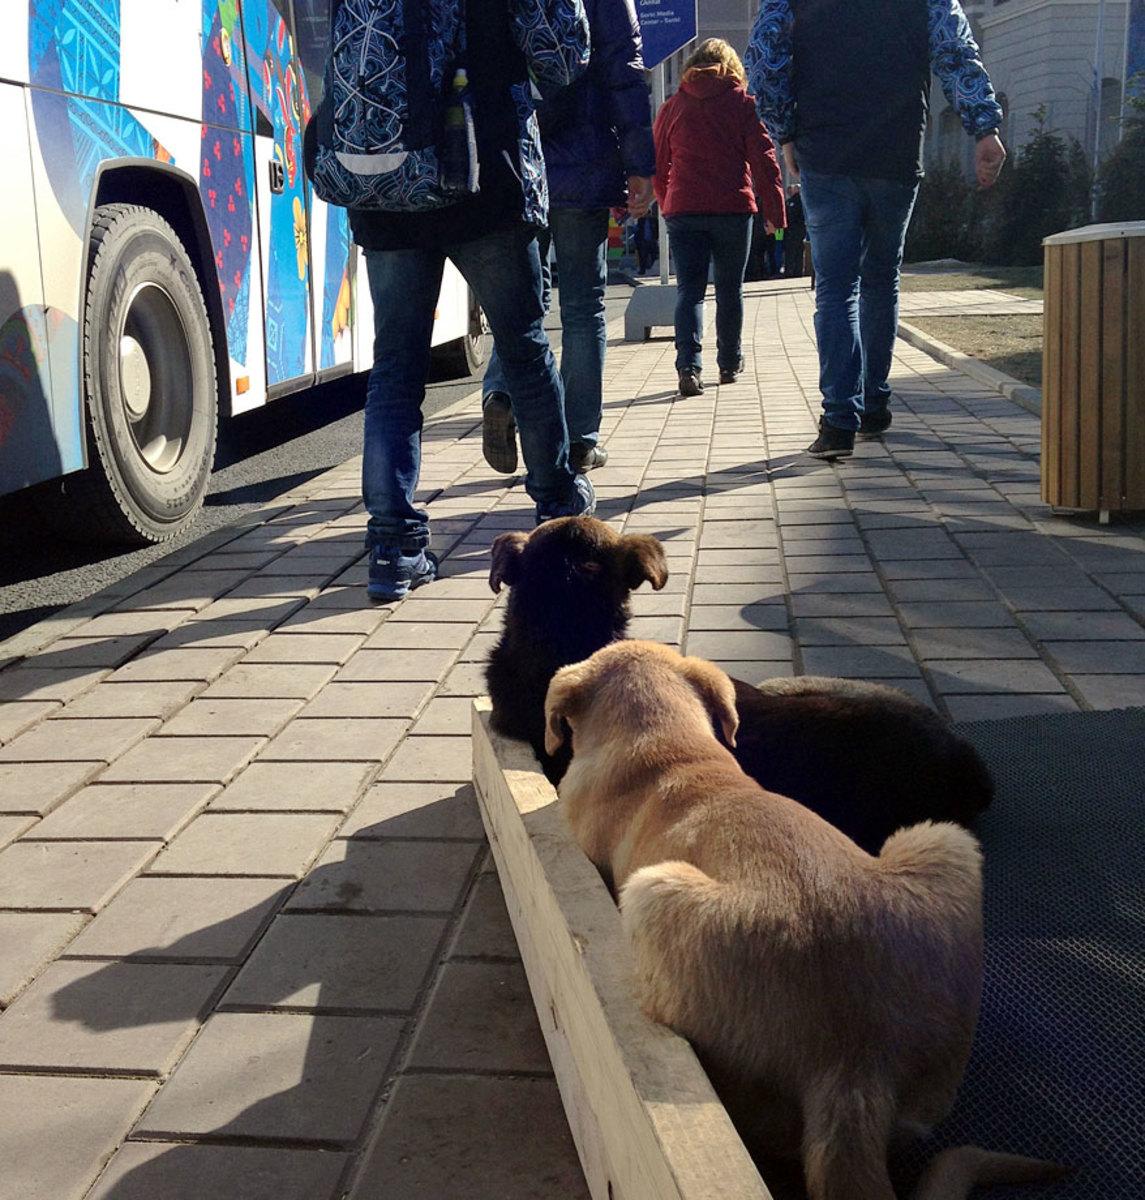 sochi-olympics-stray-dogs-austin-murphy.jpg